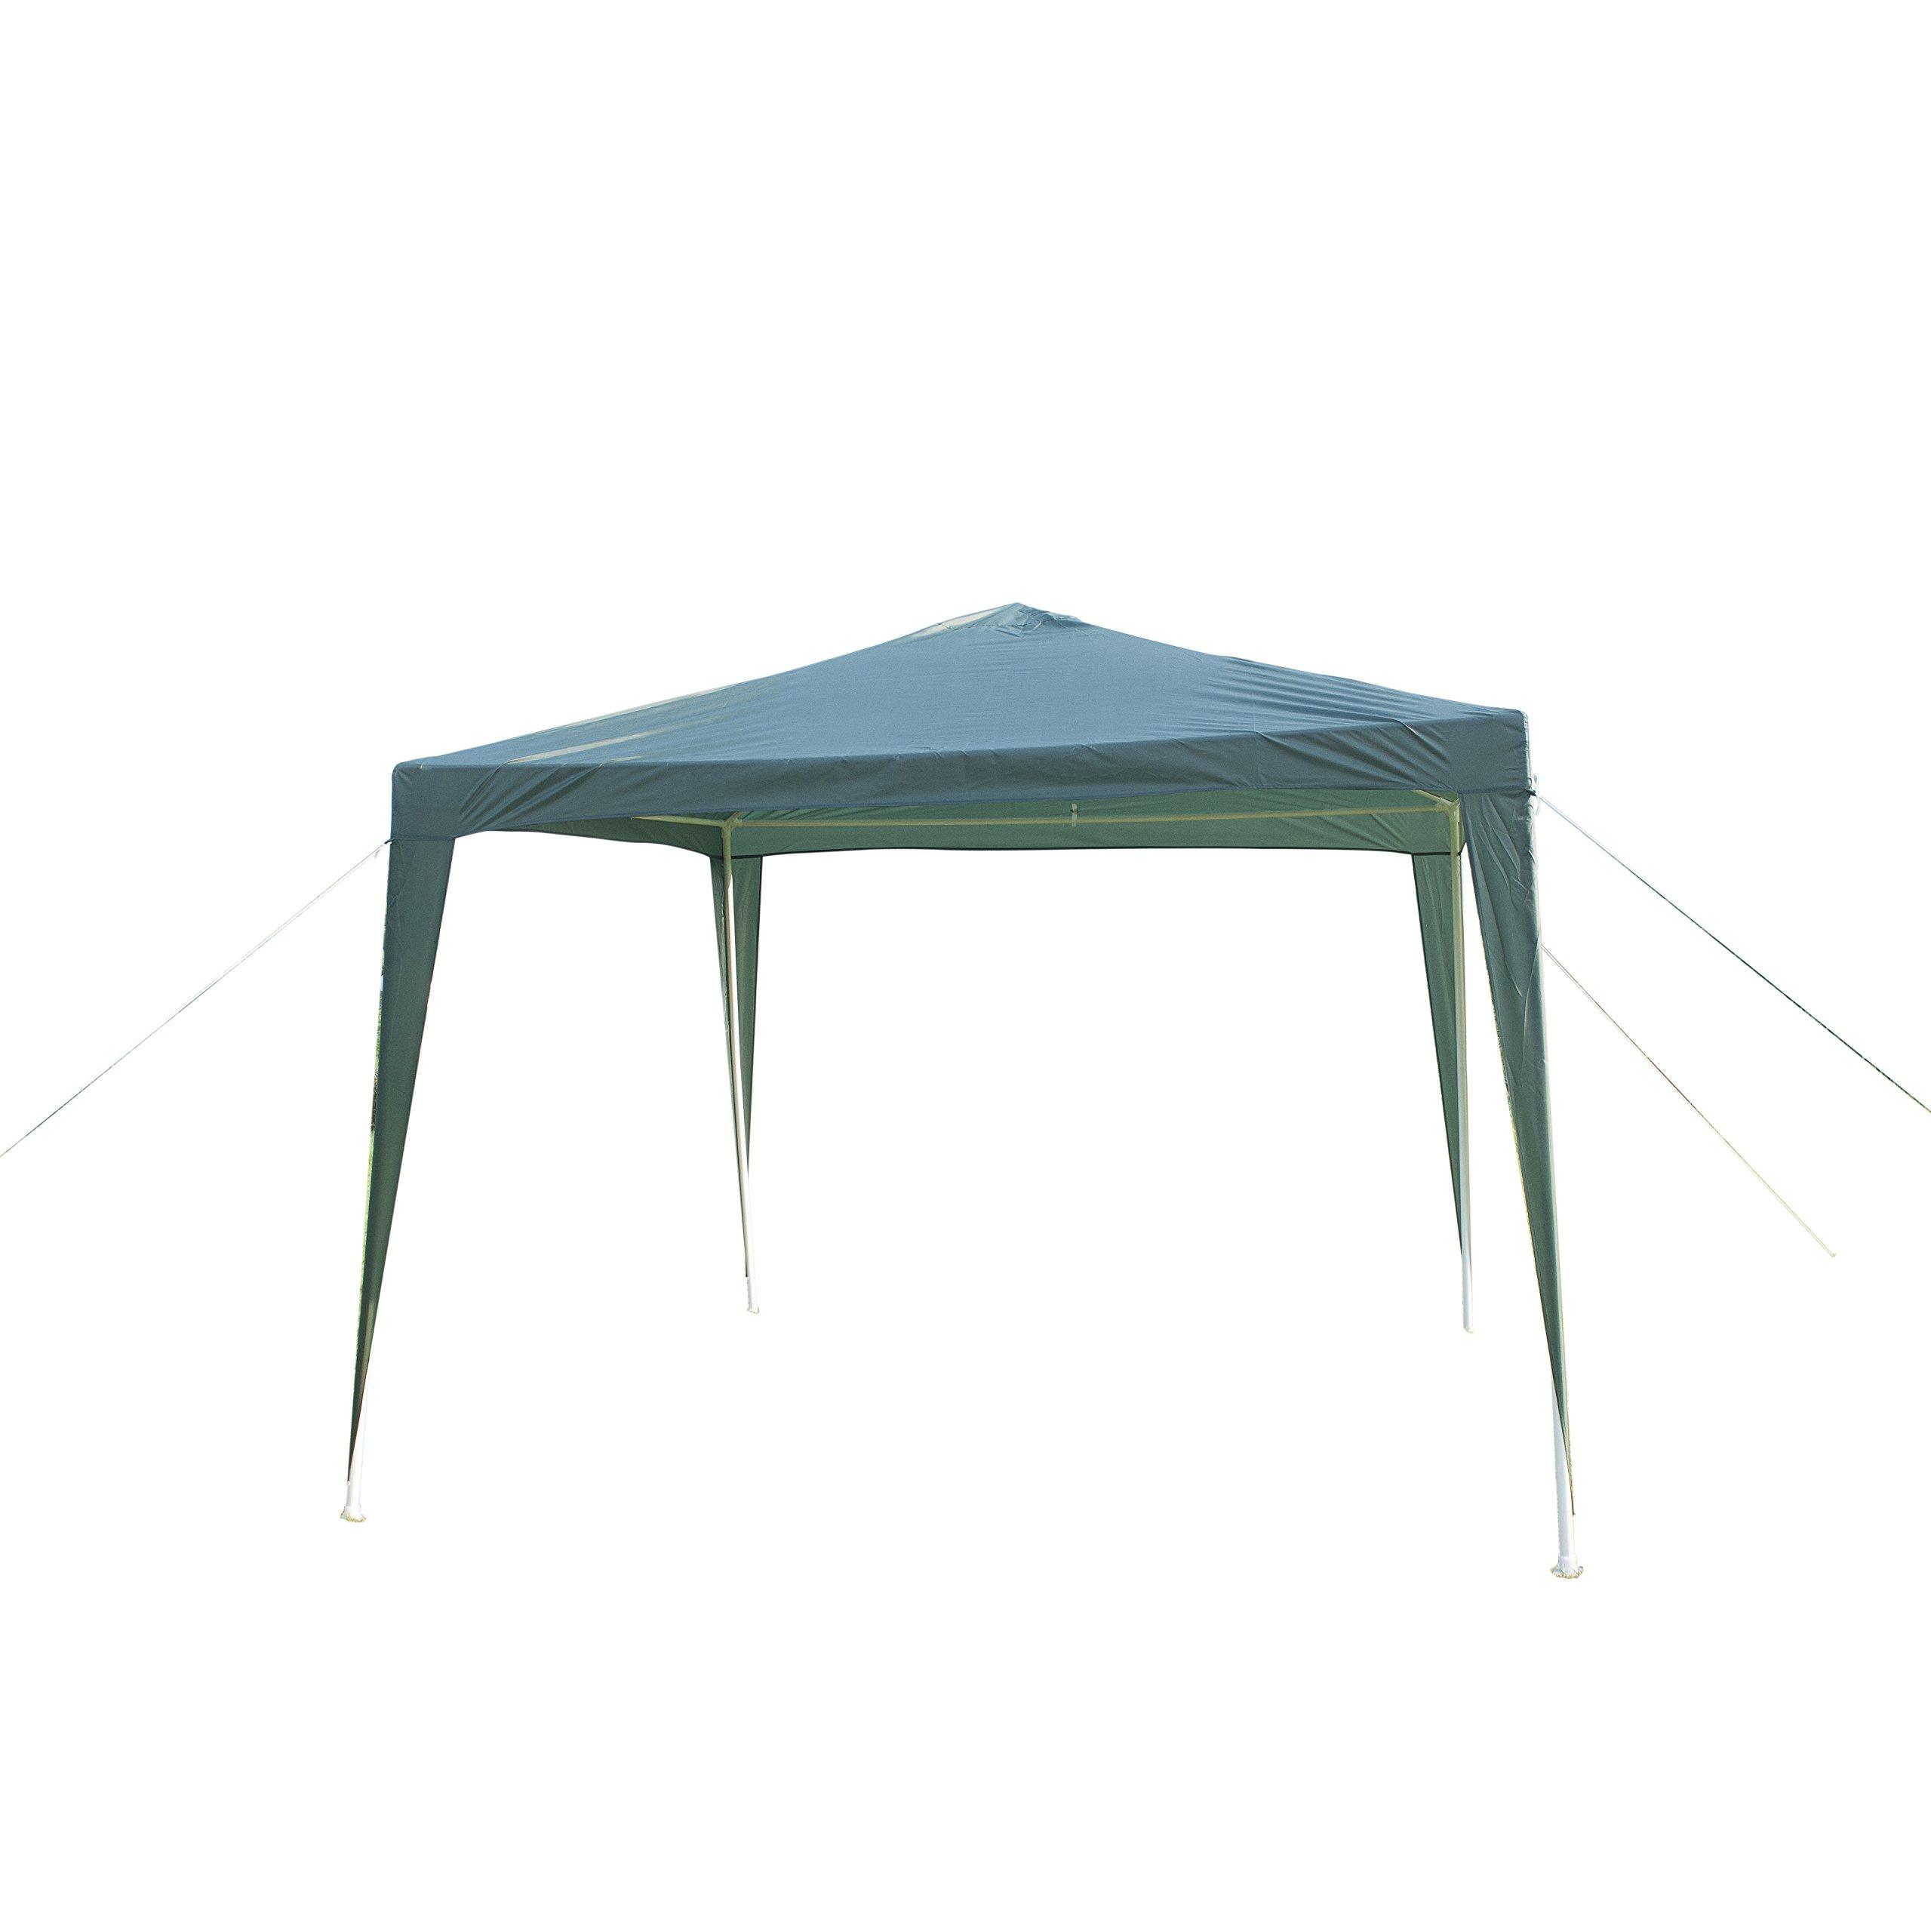 GOJOOASIS Canopy Tent Wedding Party Tent Outdoor Gazebo 10' x 10' Heavy Duty Green